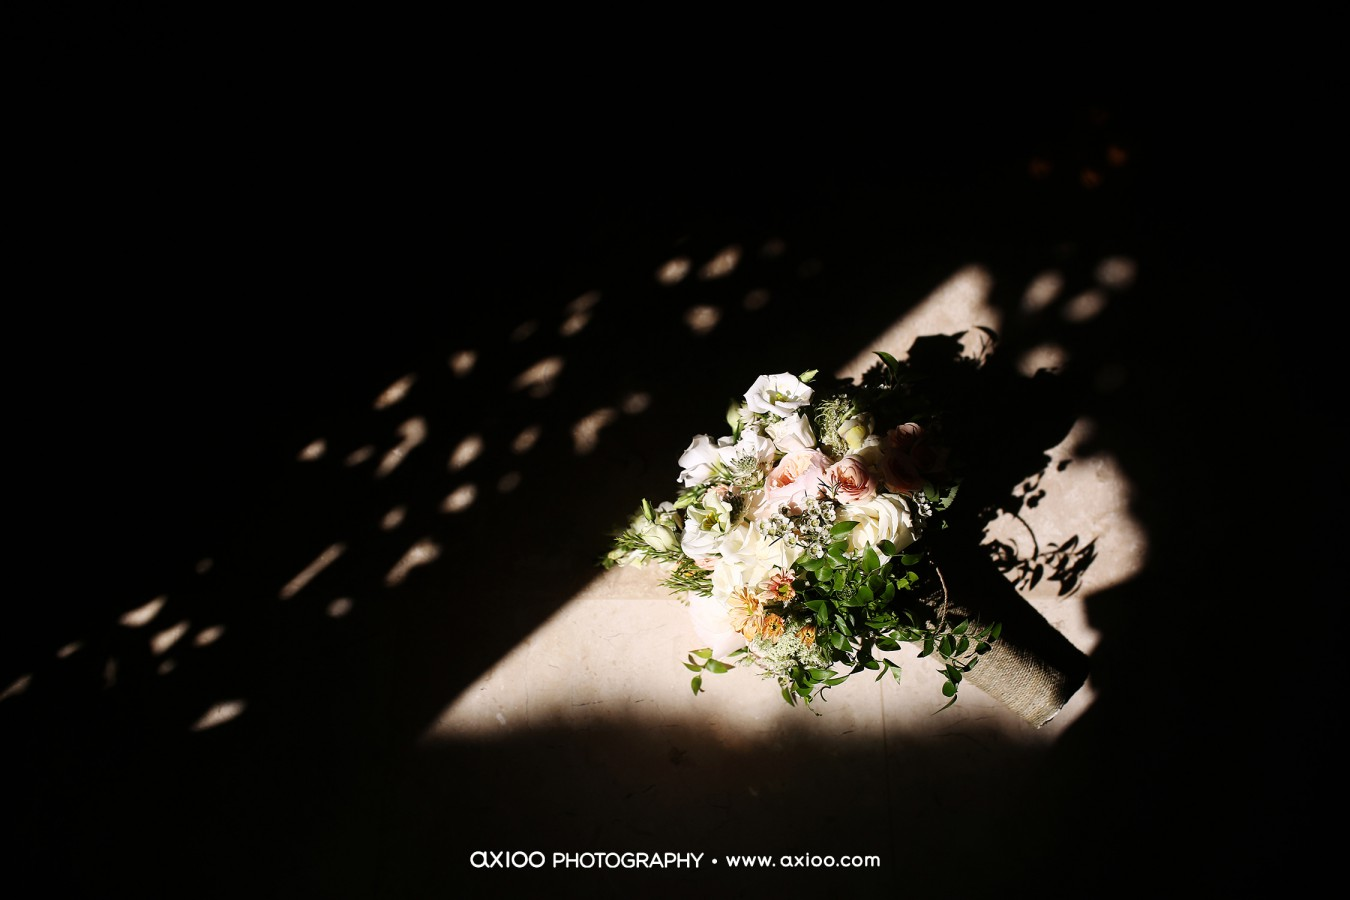 Personal Flower Landscape.5